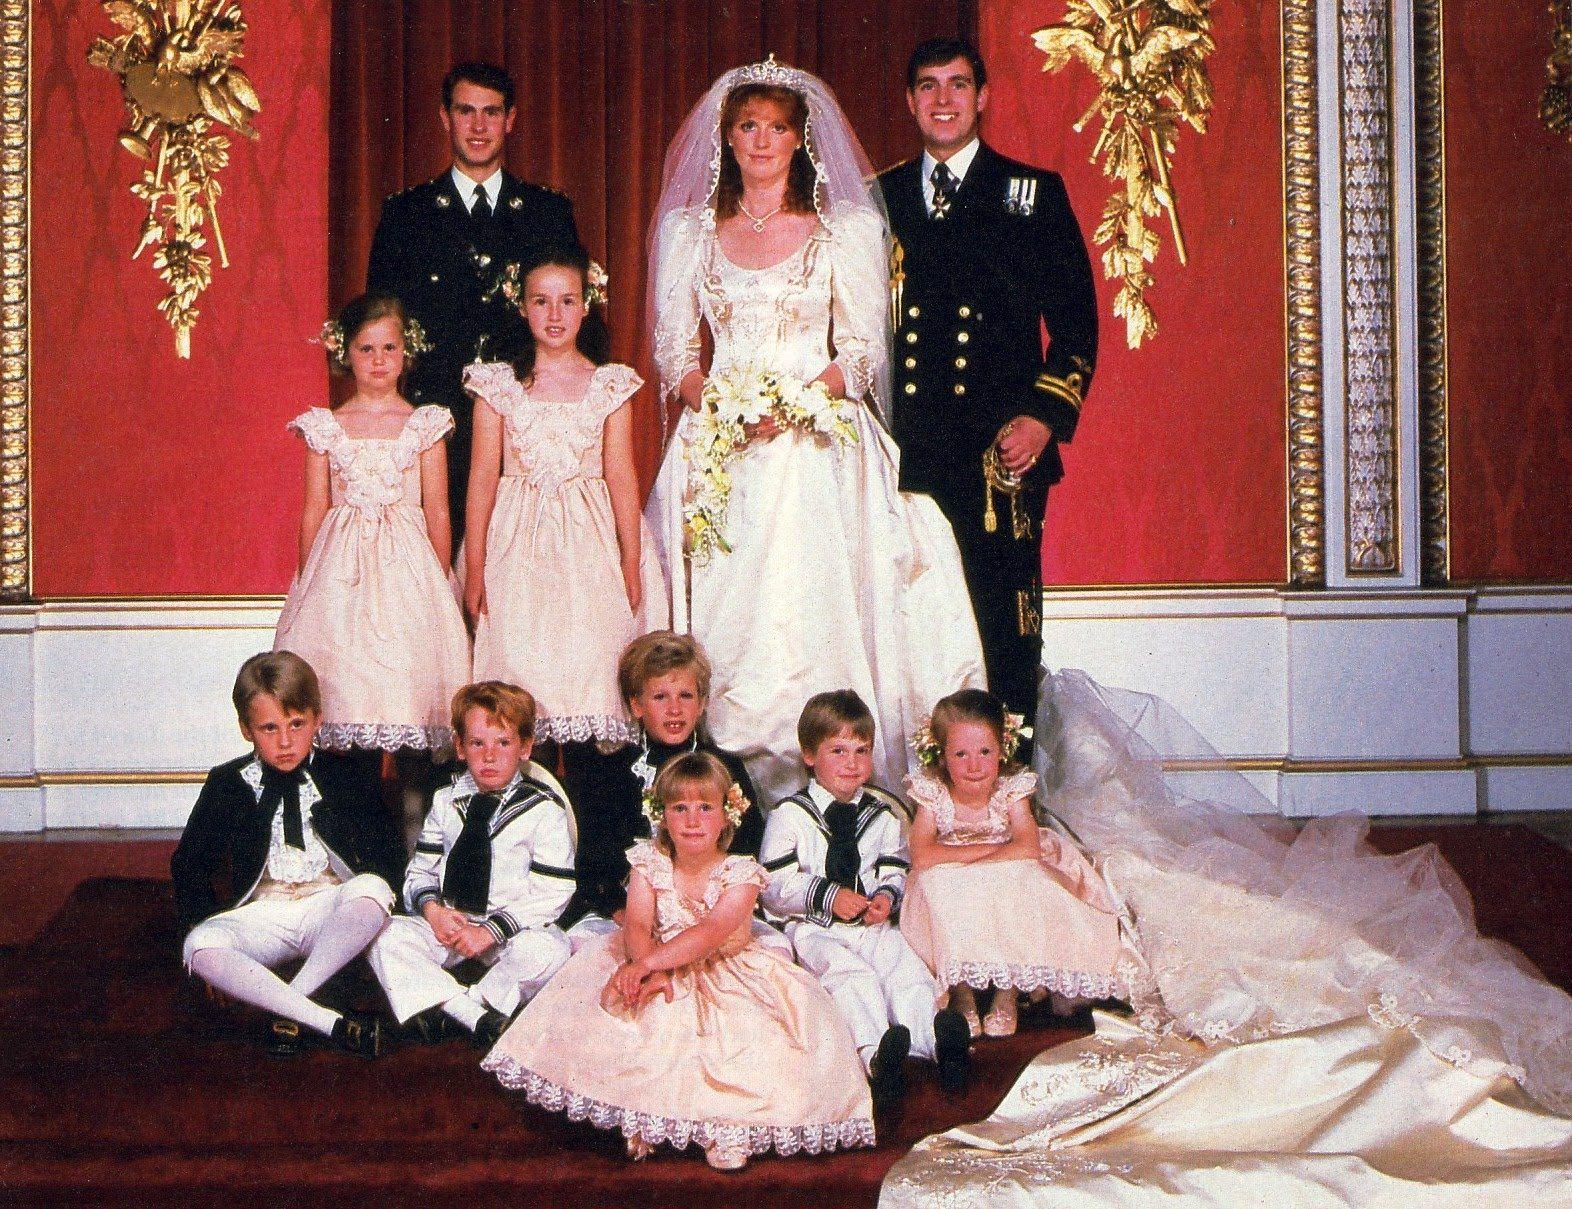 Prince Andrew & Sarah Ferguson Royal weddings, Royal